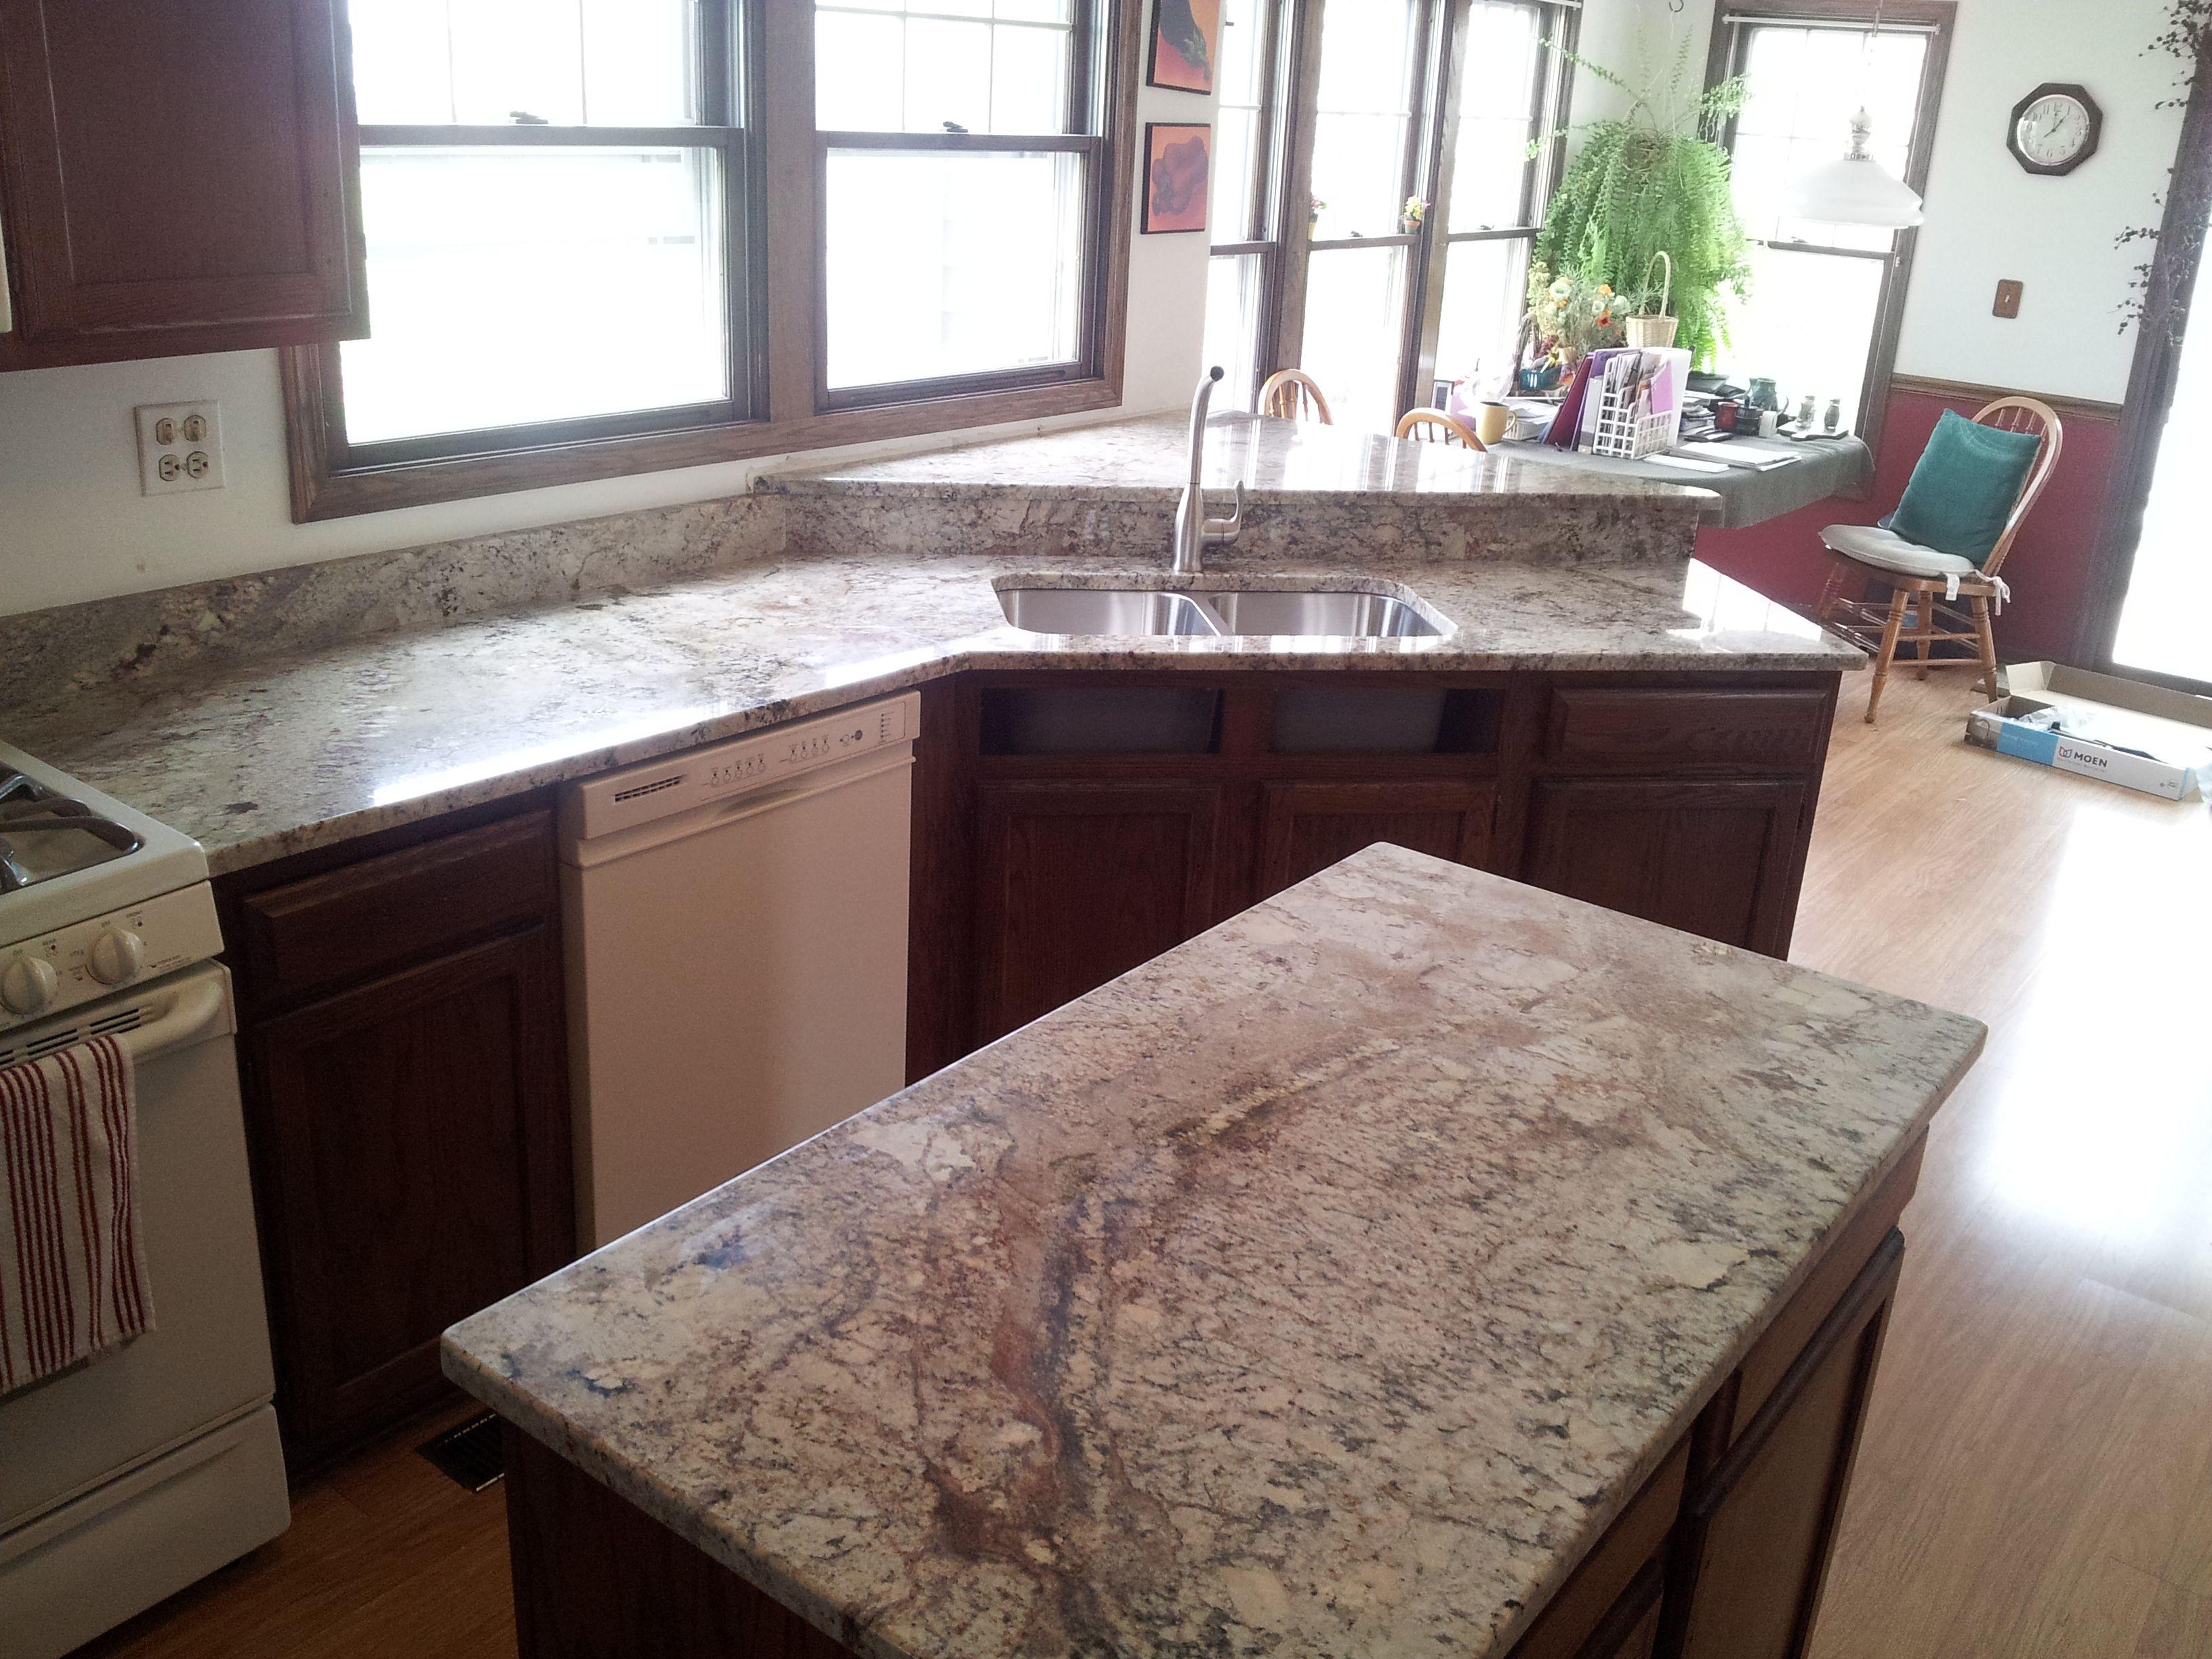 Art Granite Countertops Inc 1020 Lunt Ave Unit F Schaumburg Il 60193 Tel 847 923 1323 Kitchen And Bath Remodeling Granite Countertops Countertops